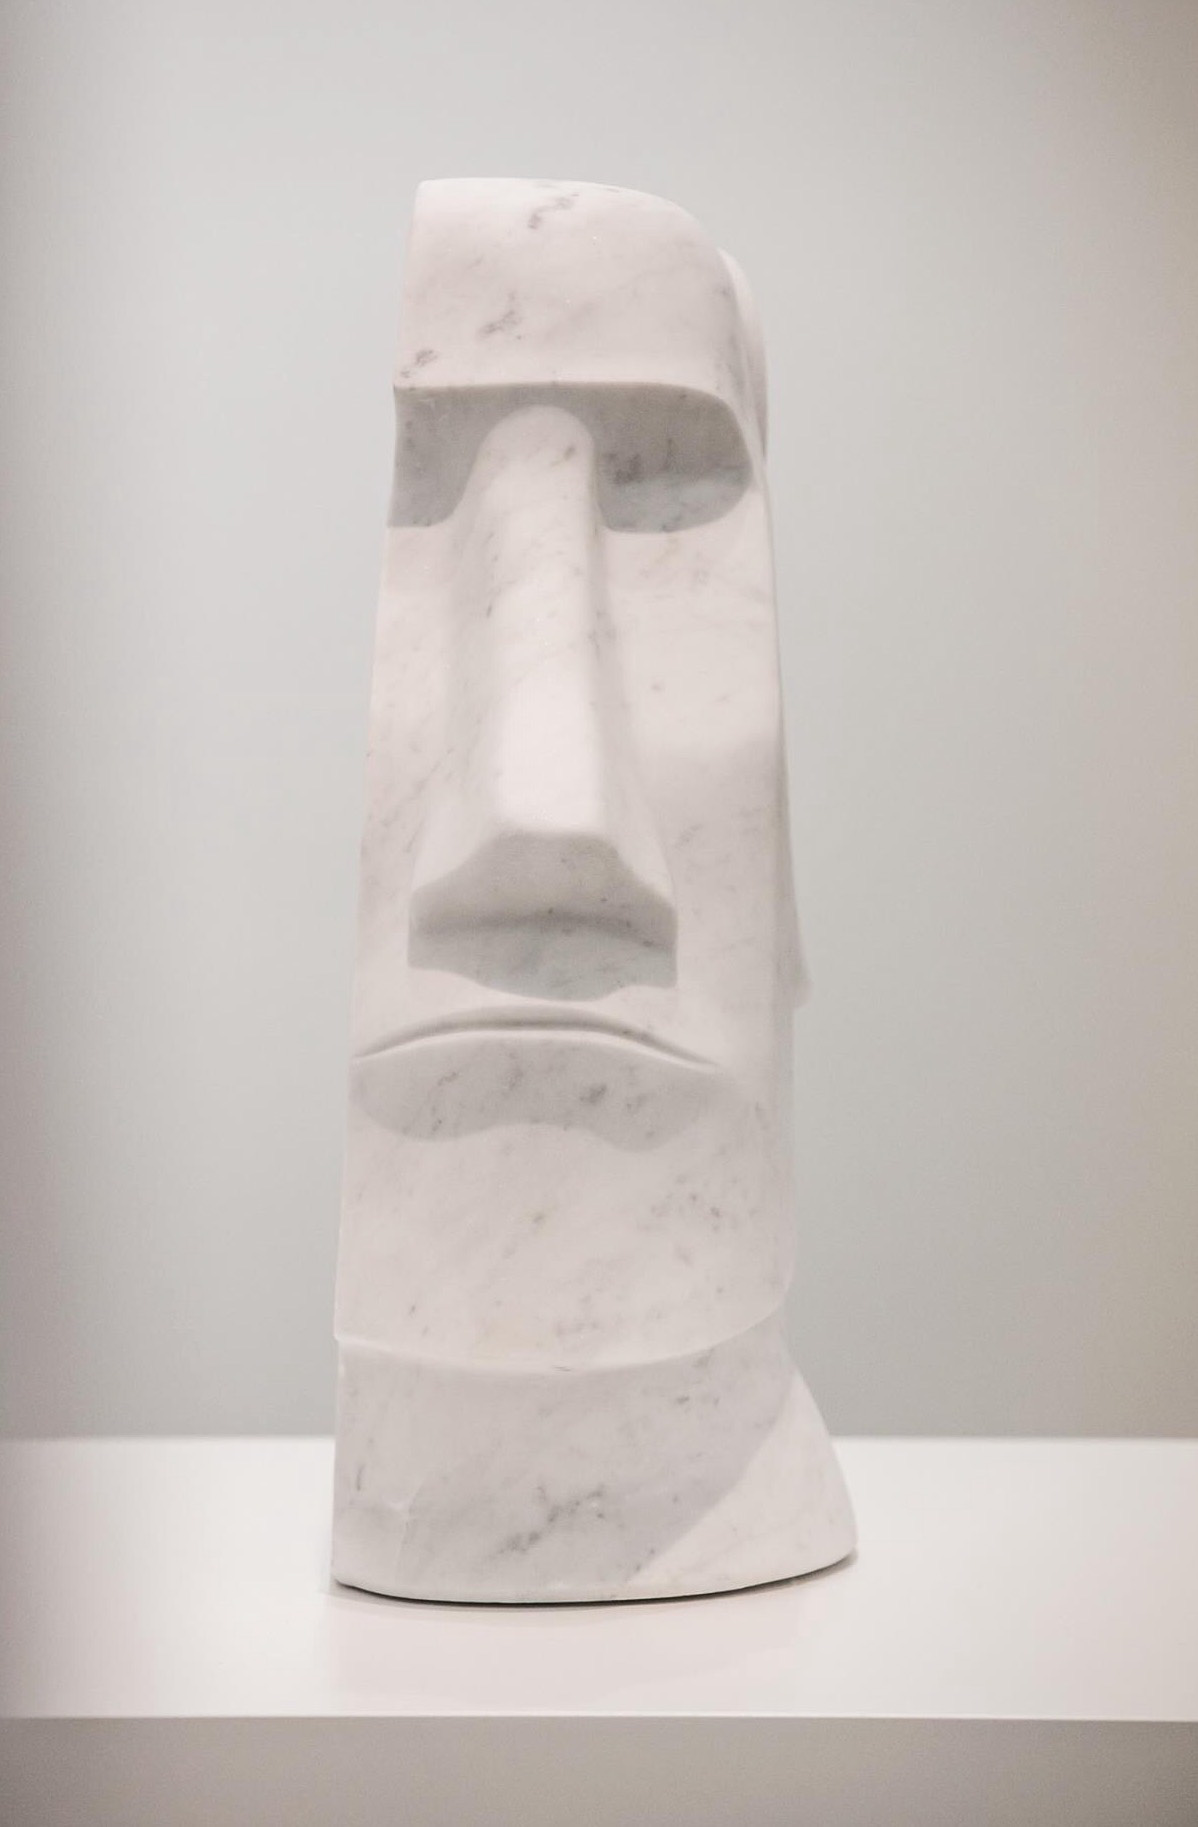 Emoji, 2015 marmo statuario  60x30 cm Moai scultura primitivismo emoticon statuaria